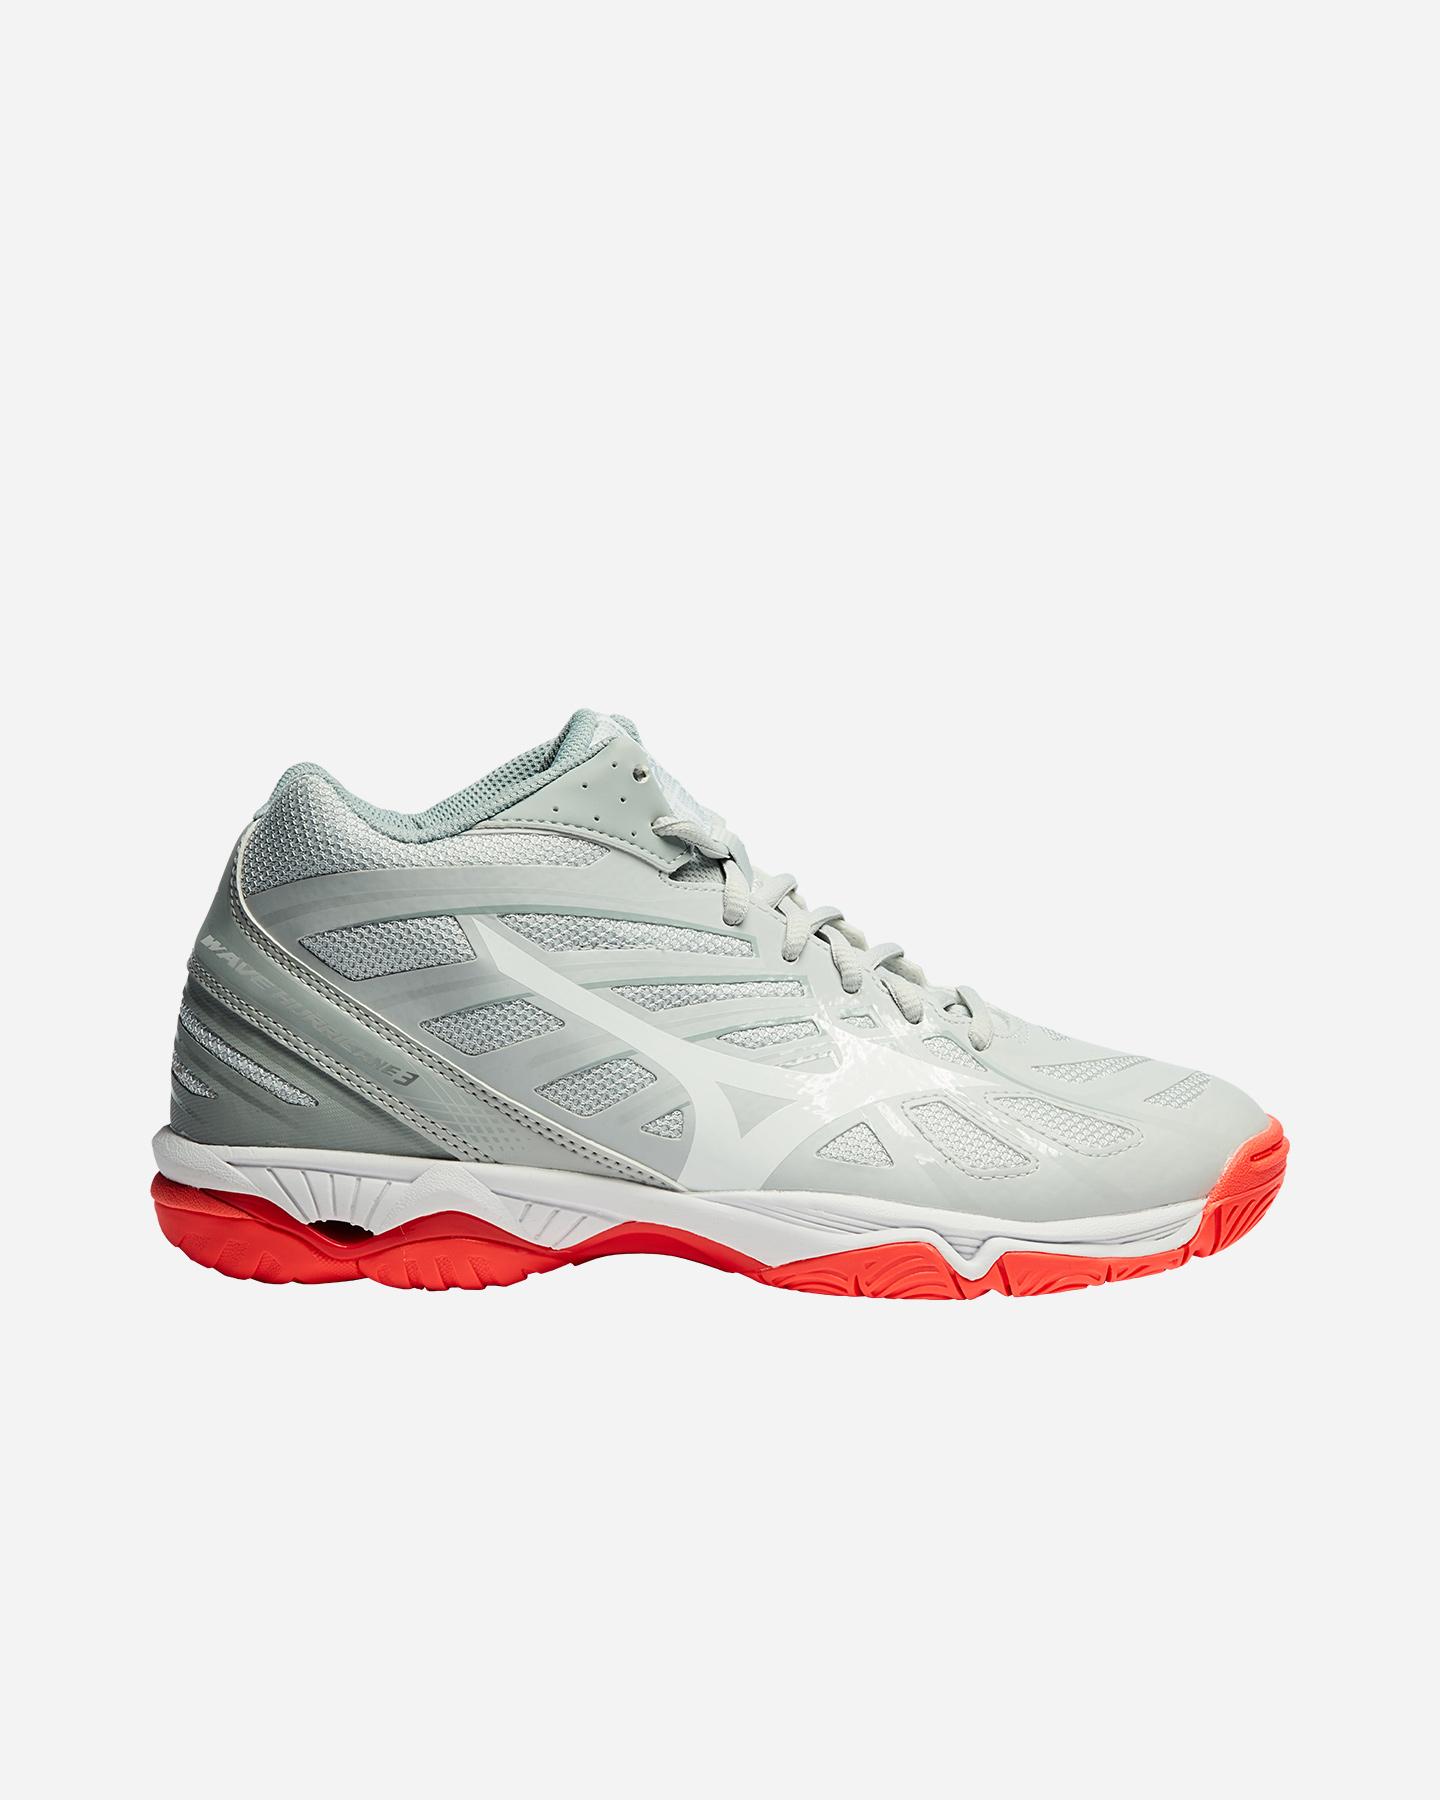 puma scarpe mizuno calcetto, Puma tec felpa medium grey